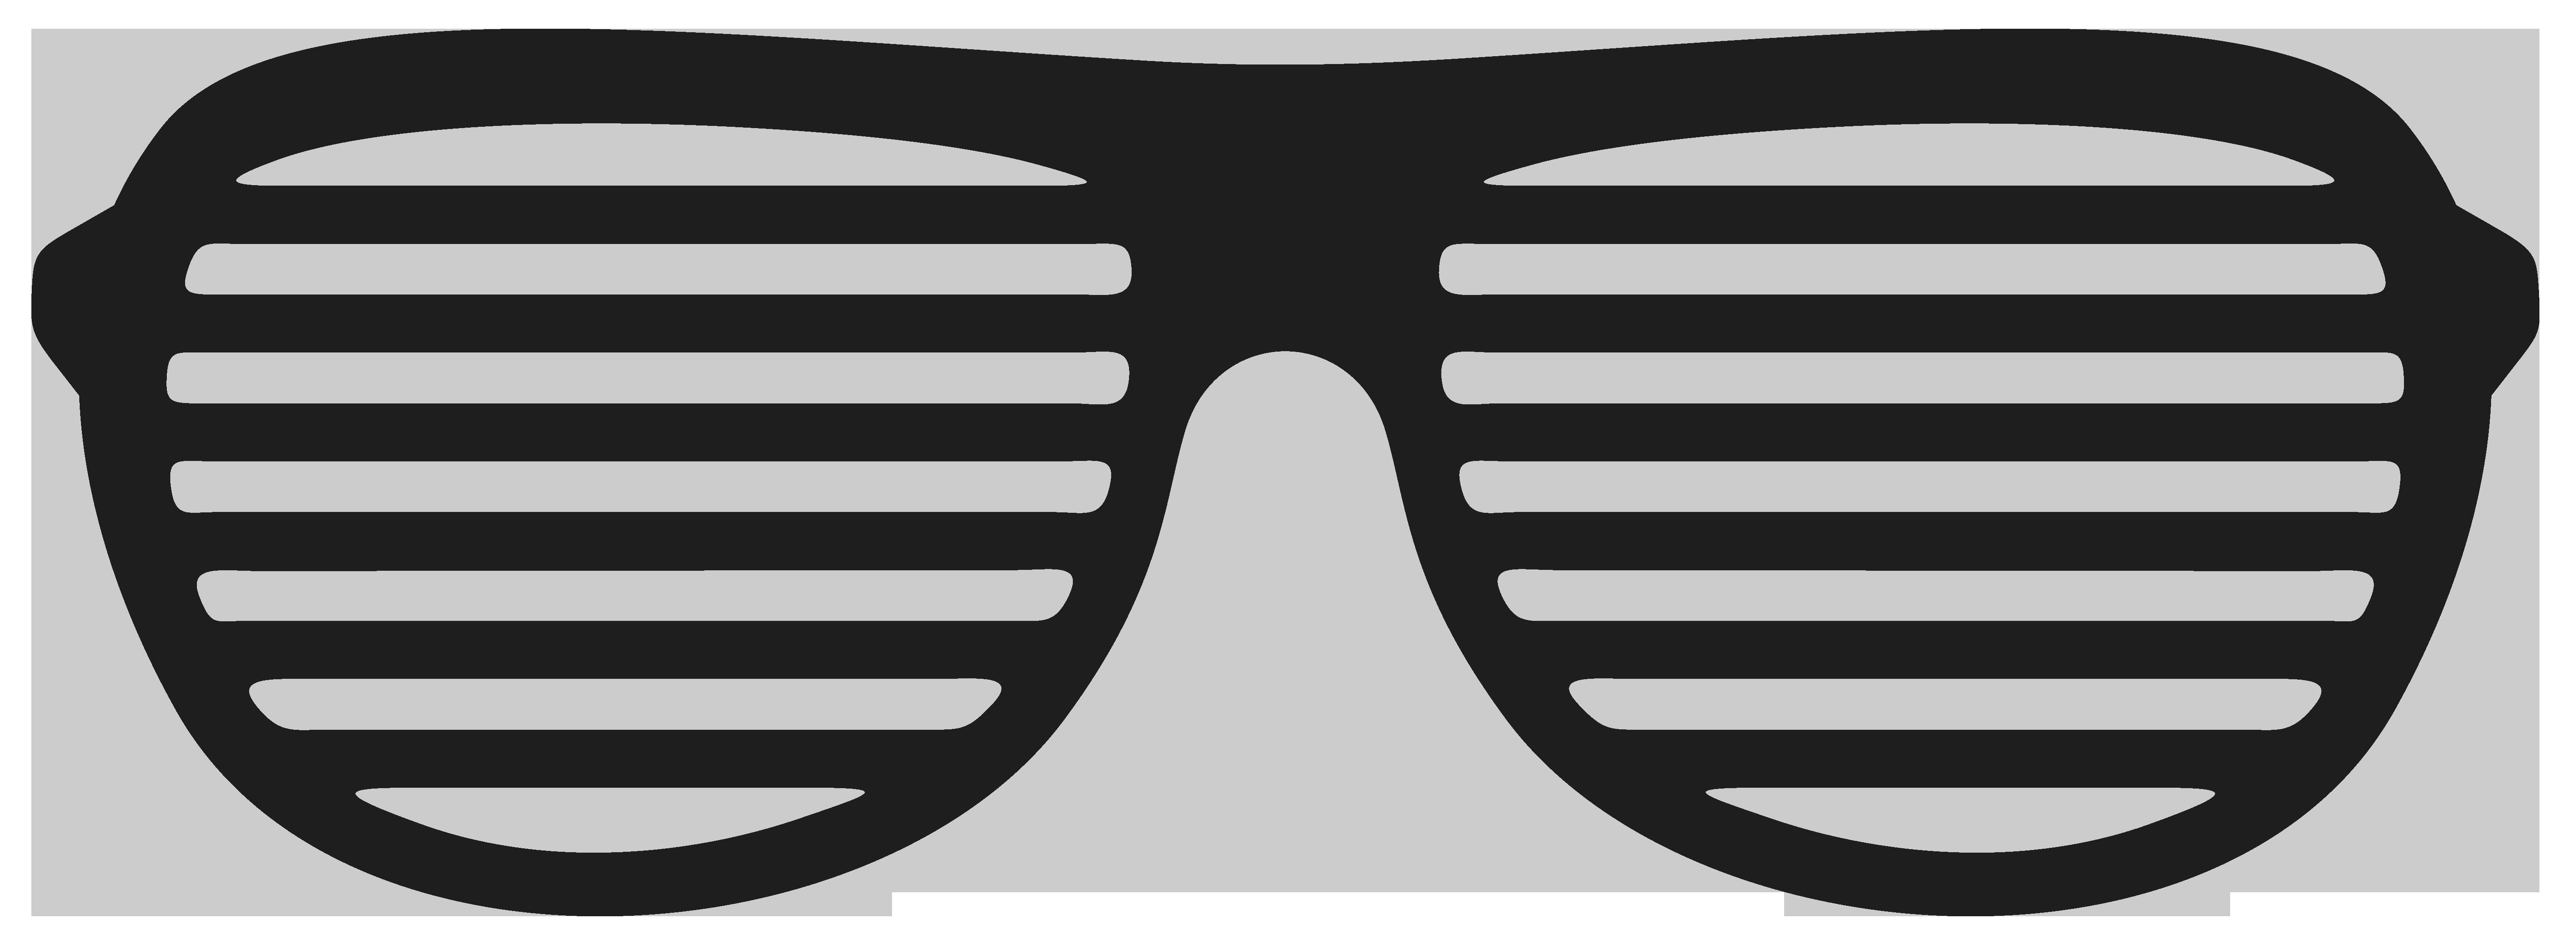 Shutter shades Sunglasses Stock illustration Clip art